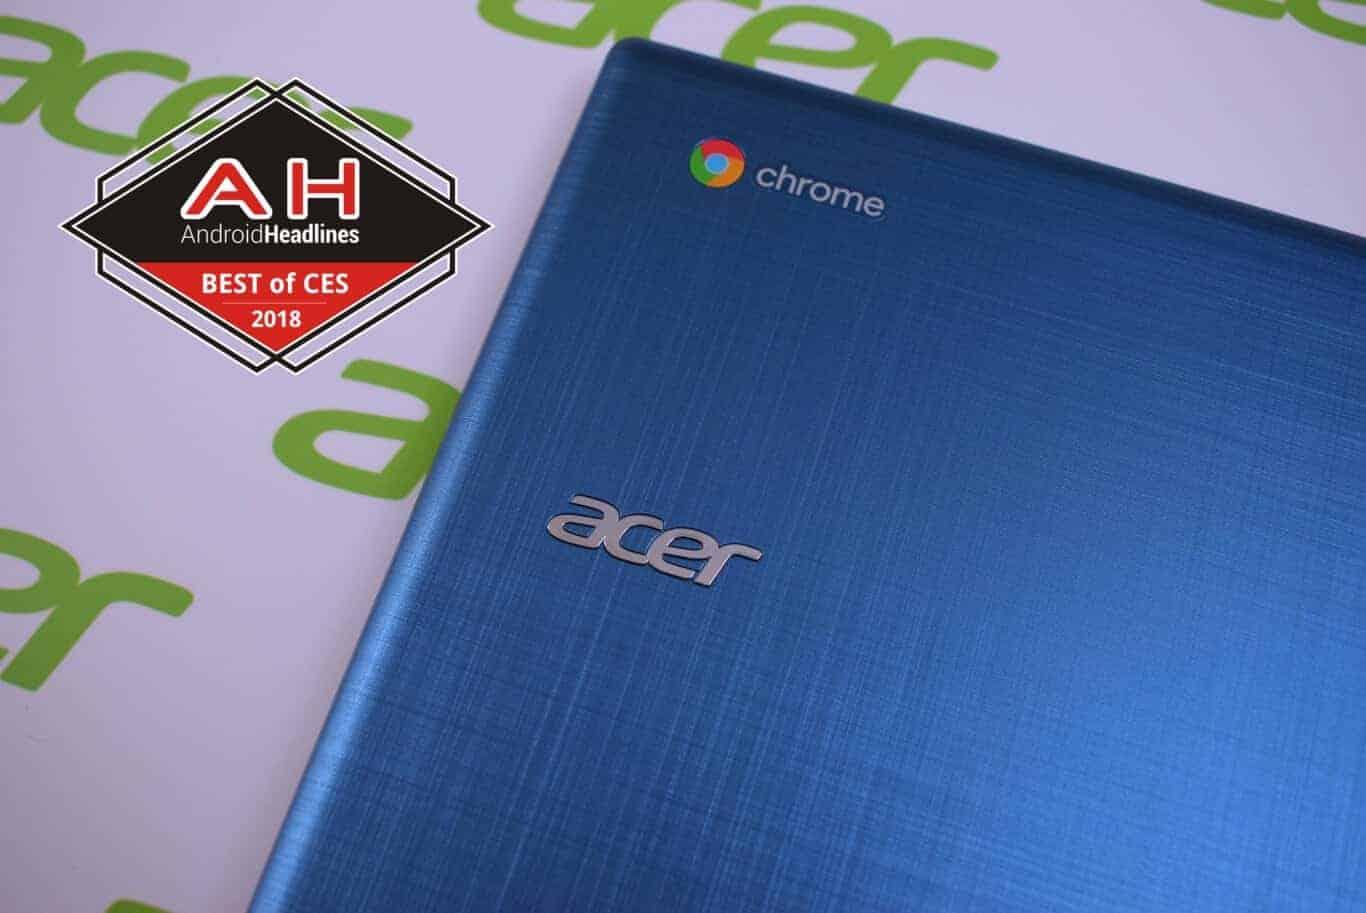 Acer Chromebook 11 Best CES AH 03 1